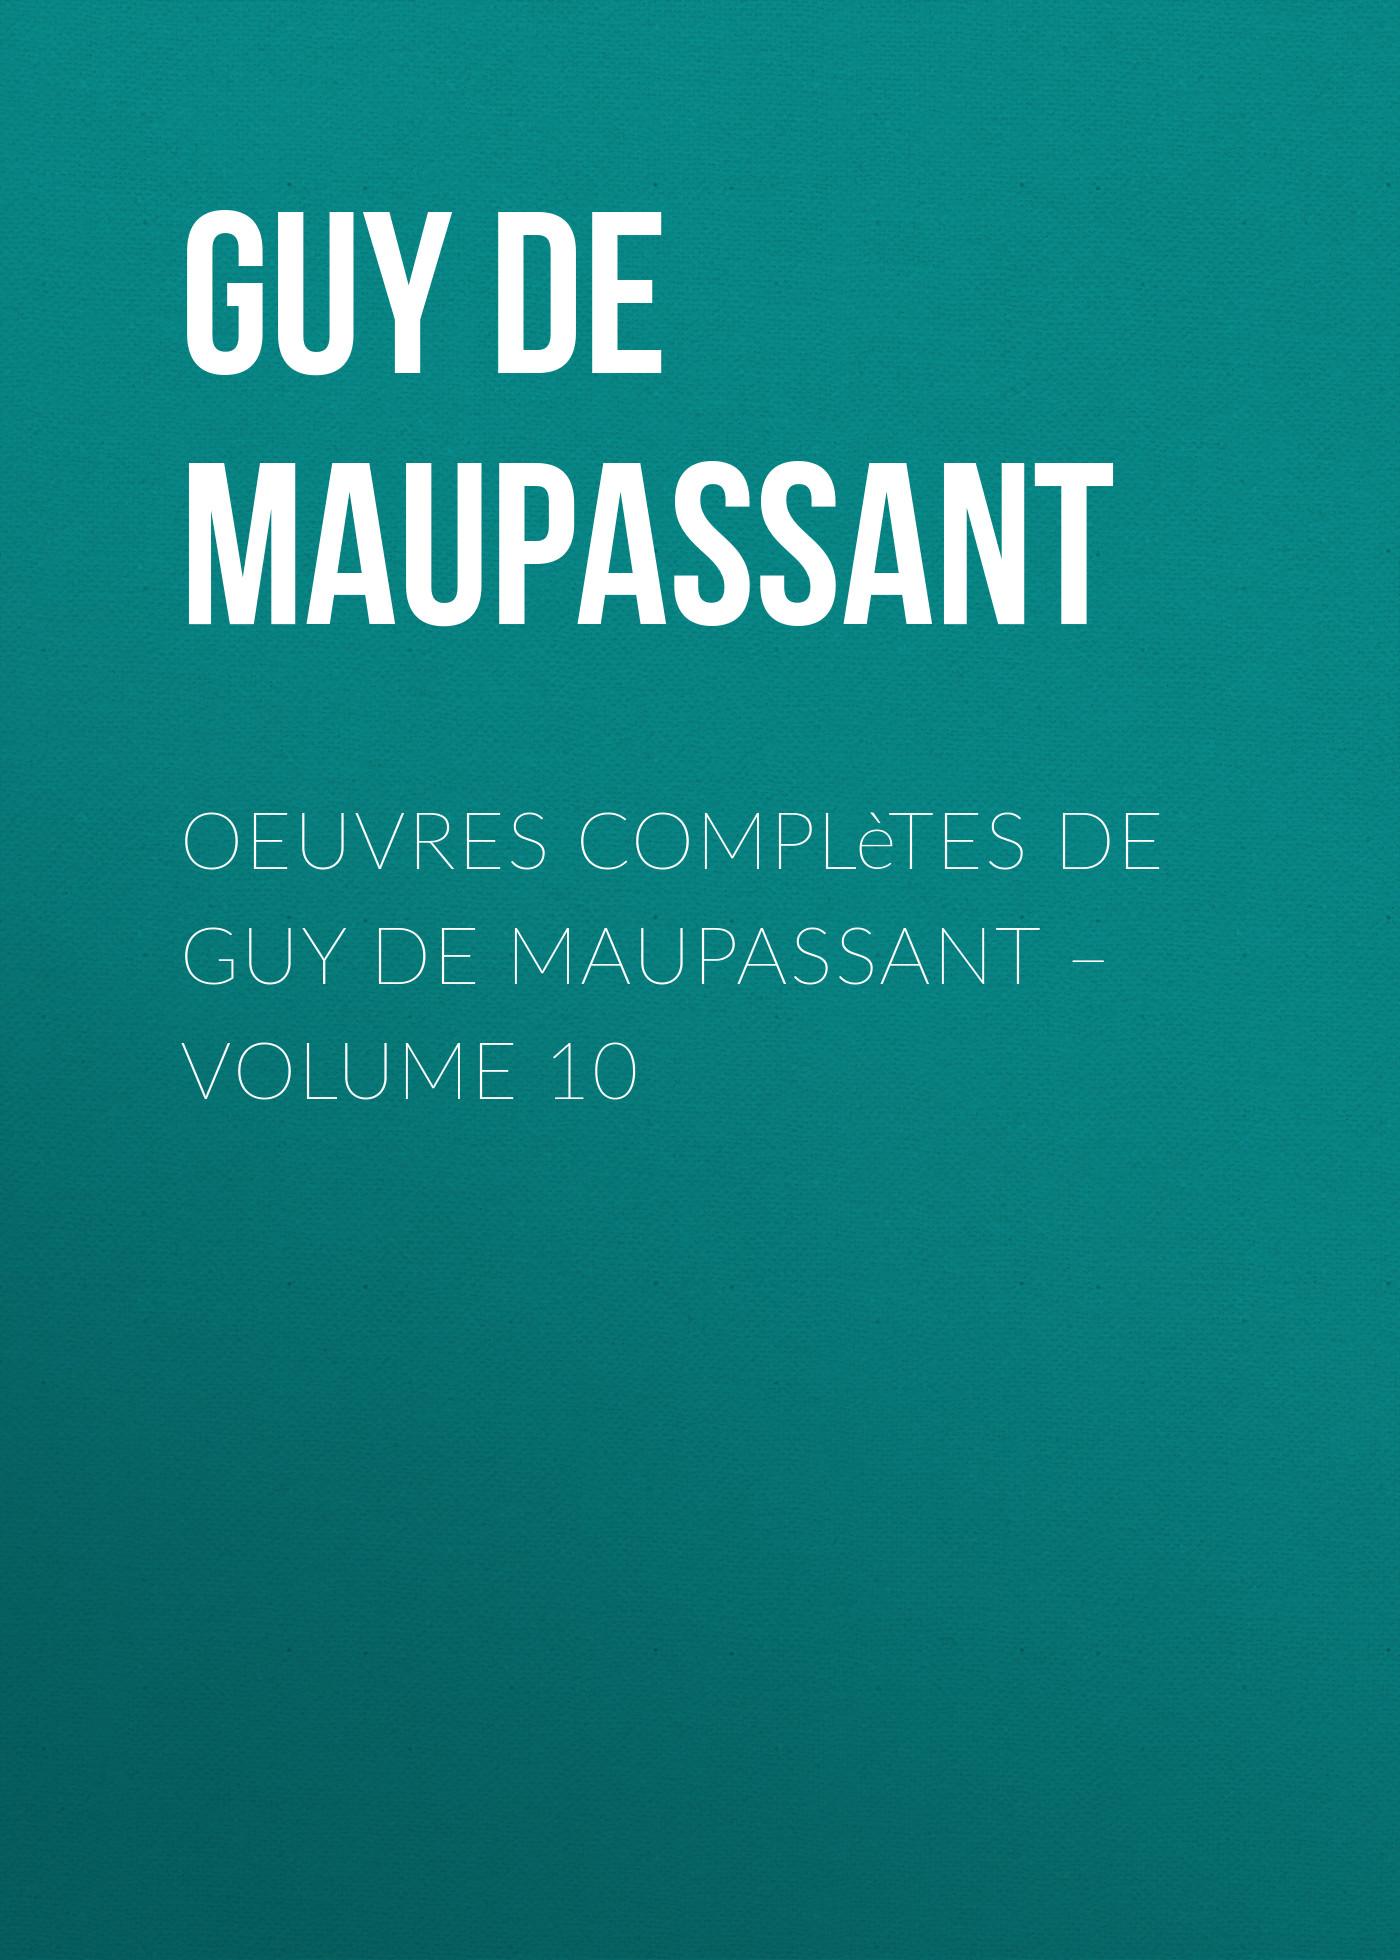 Ги де Мопассан Oeuvres complètes de Guy de Maupassant – volume 10 ги де мопассан œuvres complètes de guy de maupassant volume 03